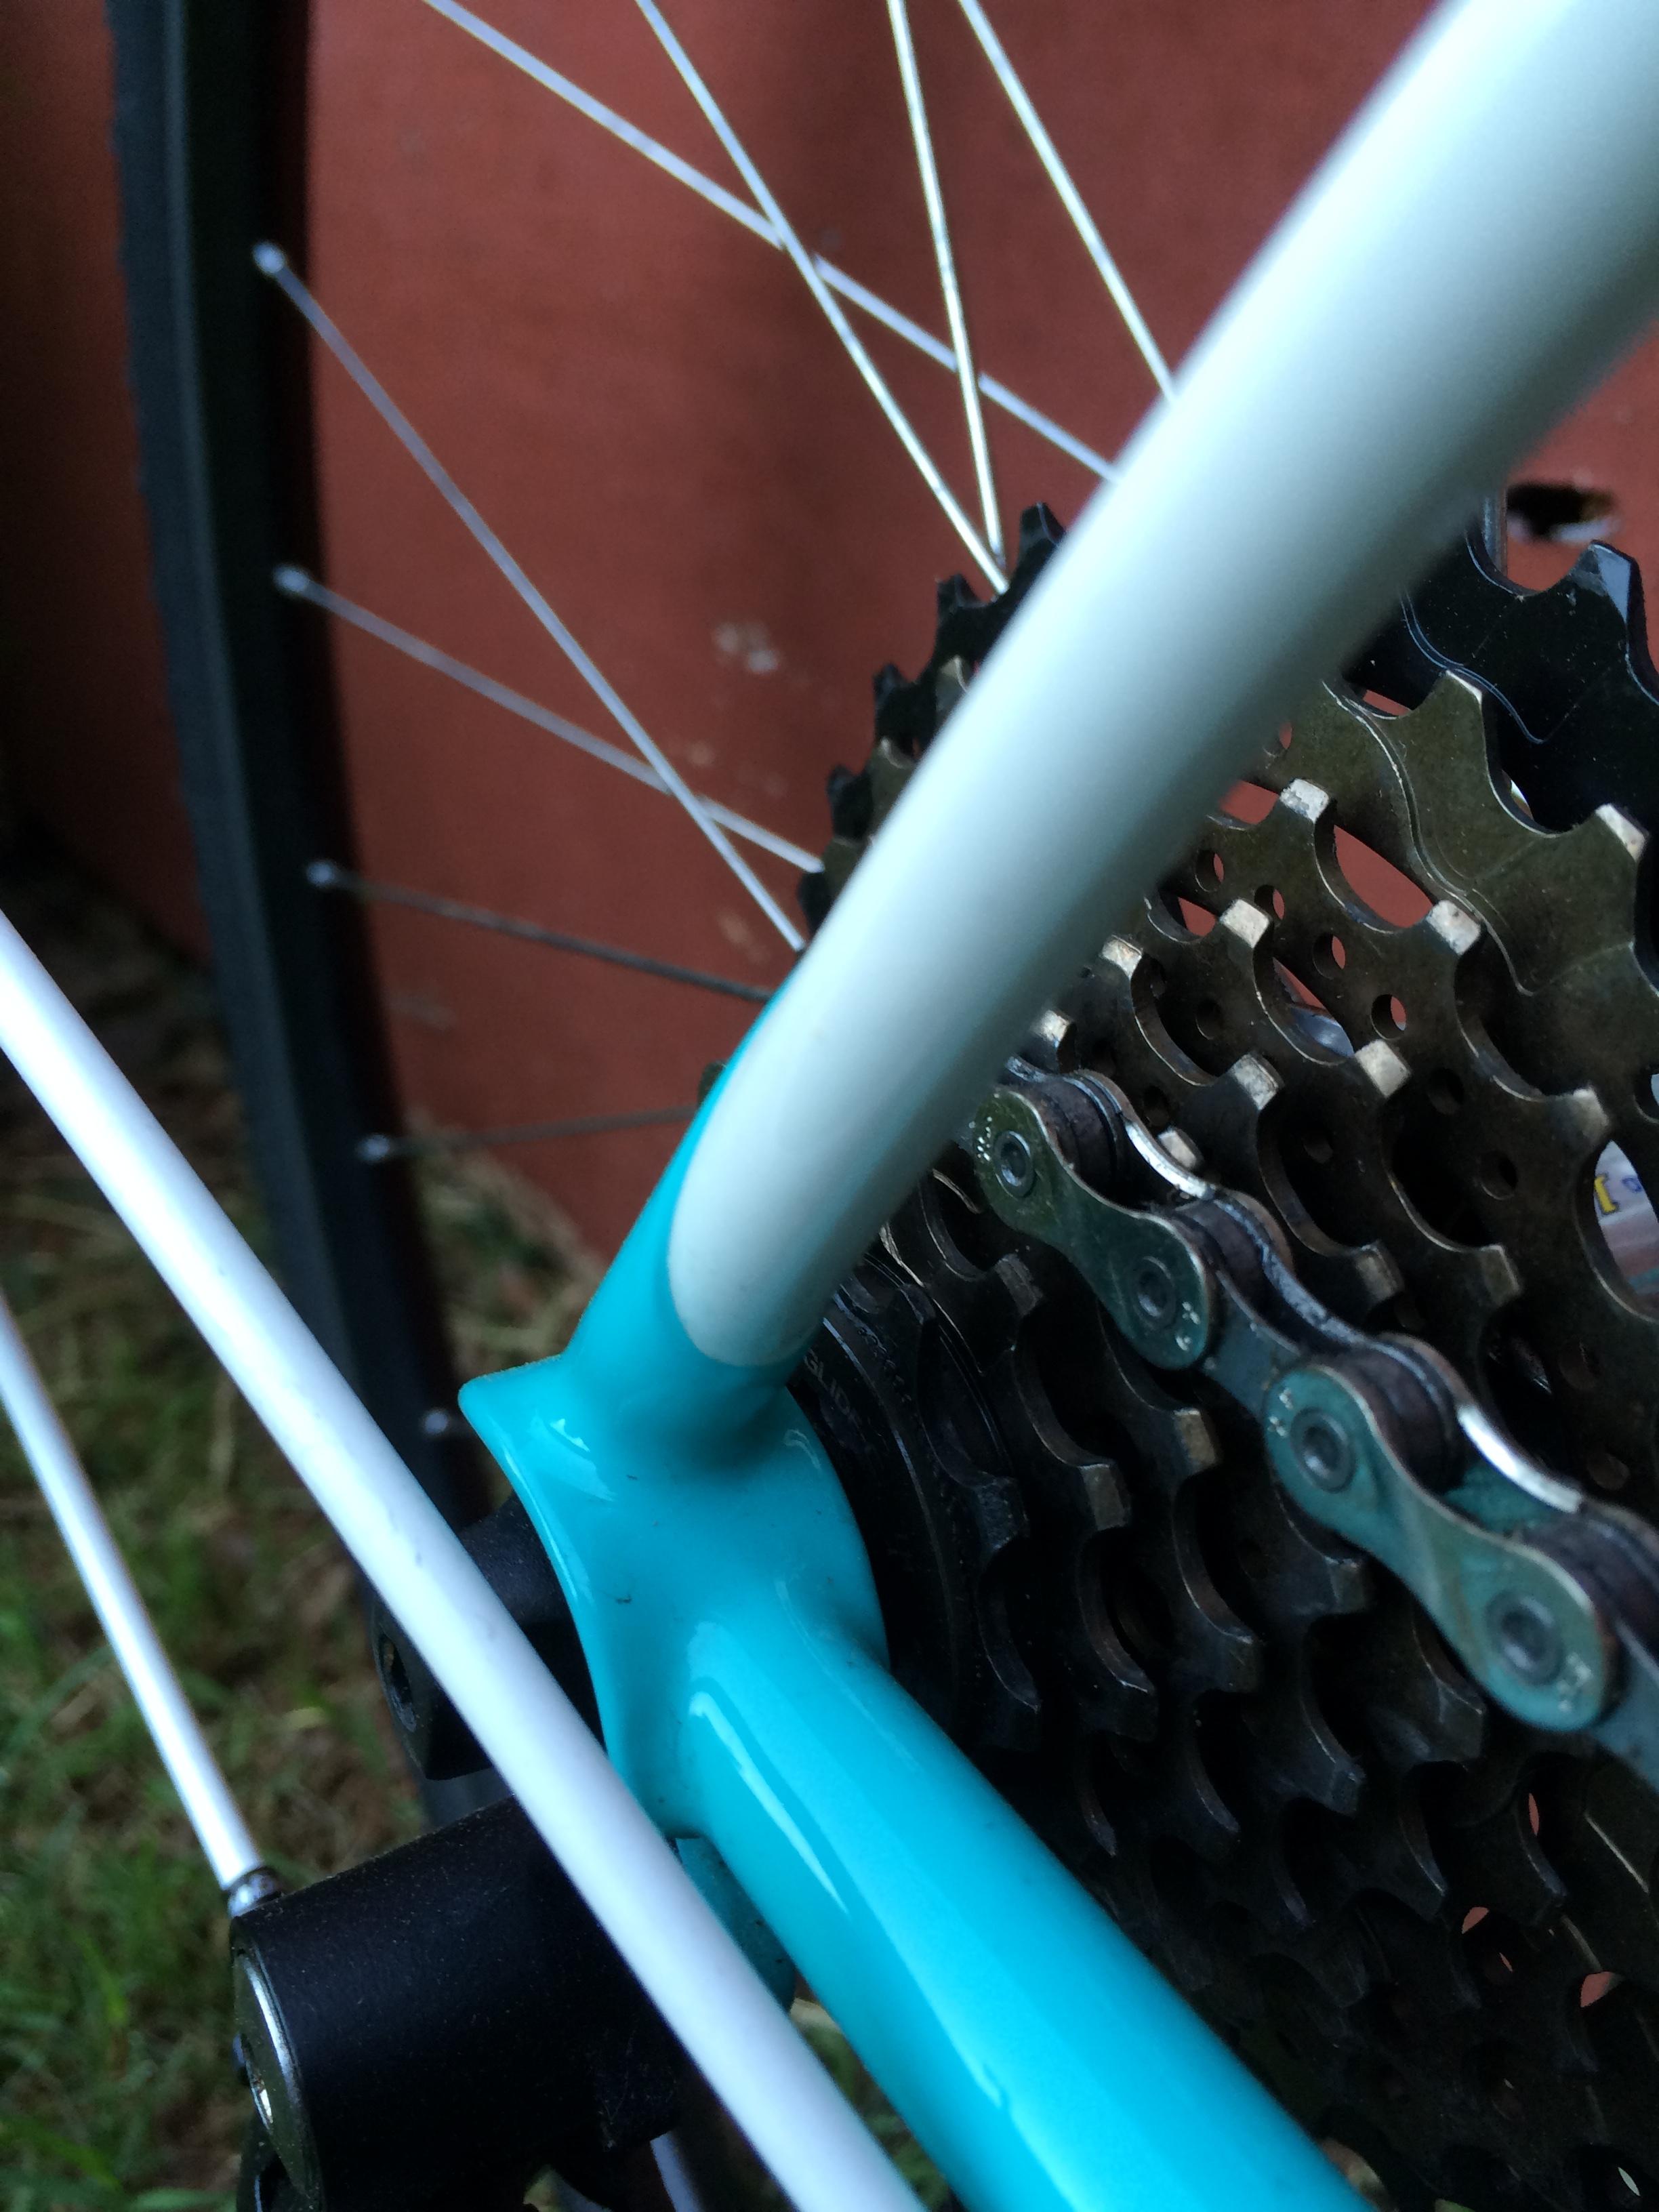 Dogwood-cycleworx-steel-custom-bicycle-columbus-tubing-cyclo-cross-7.jpg